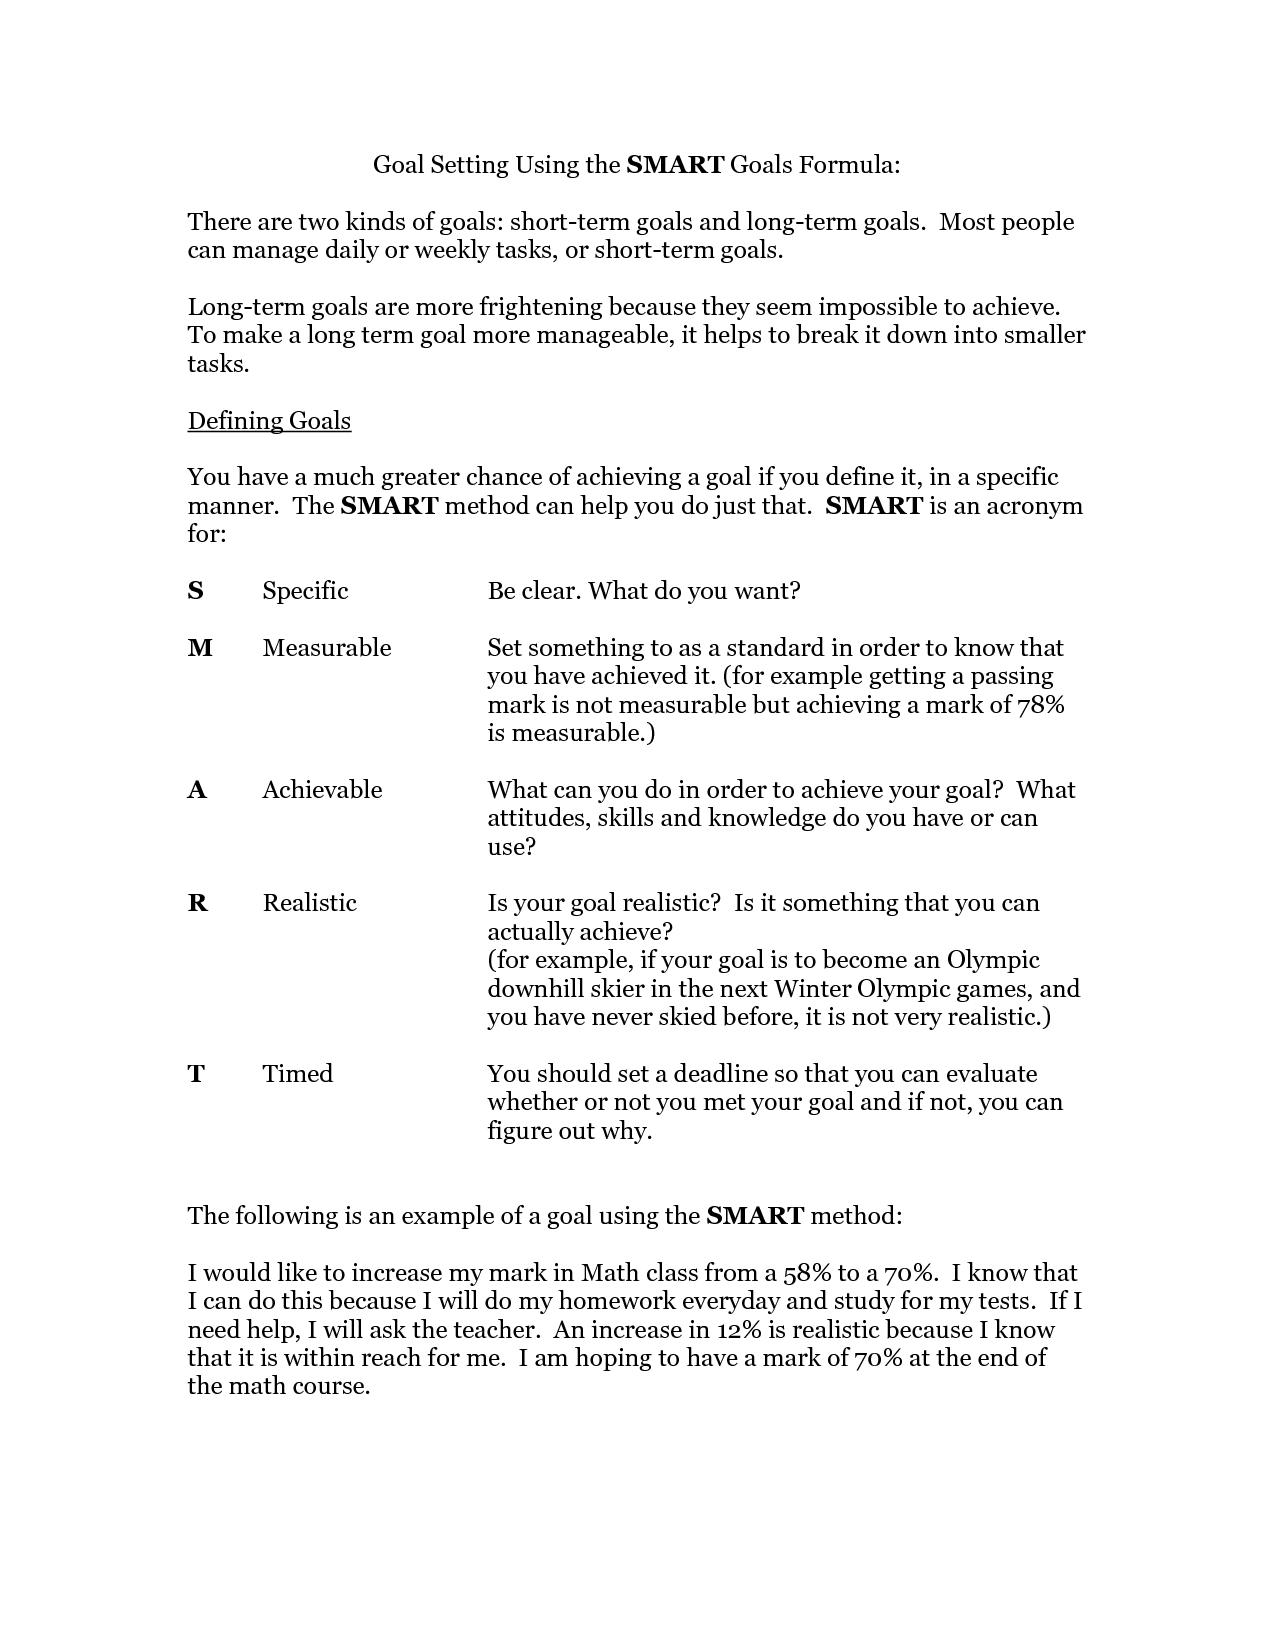 Smart Goals Worksheet  Goal Setting Using The Smart Goals Formula